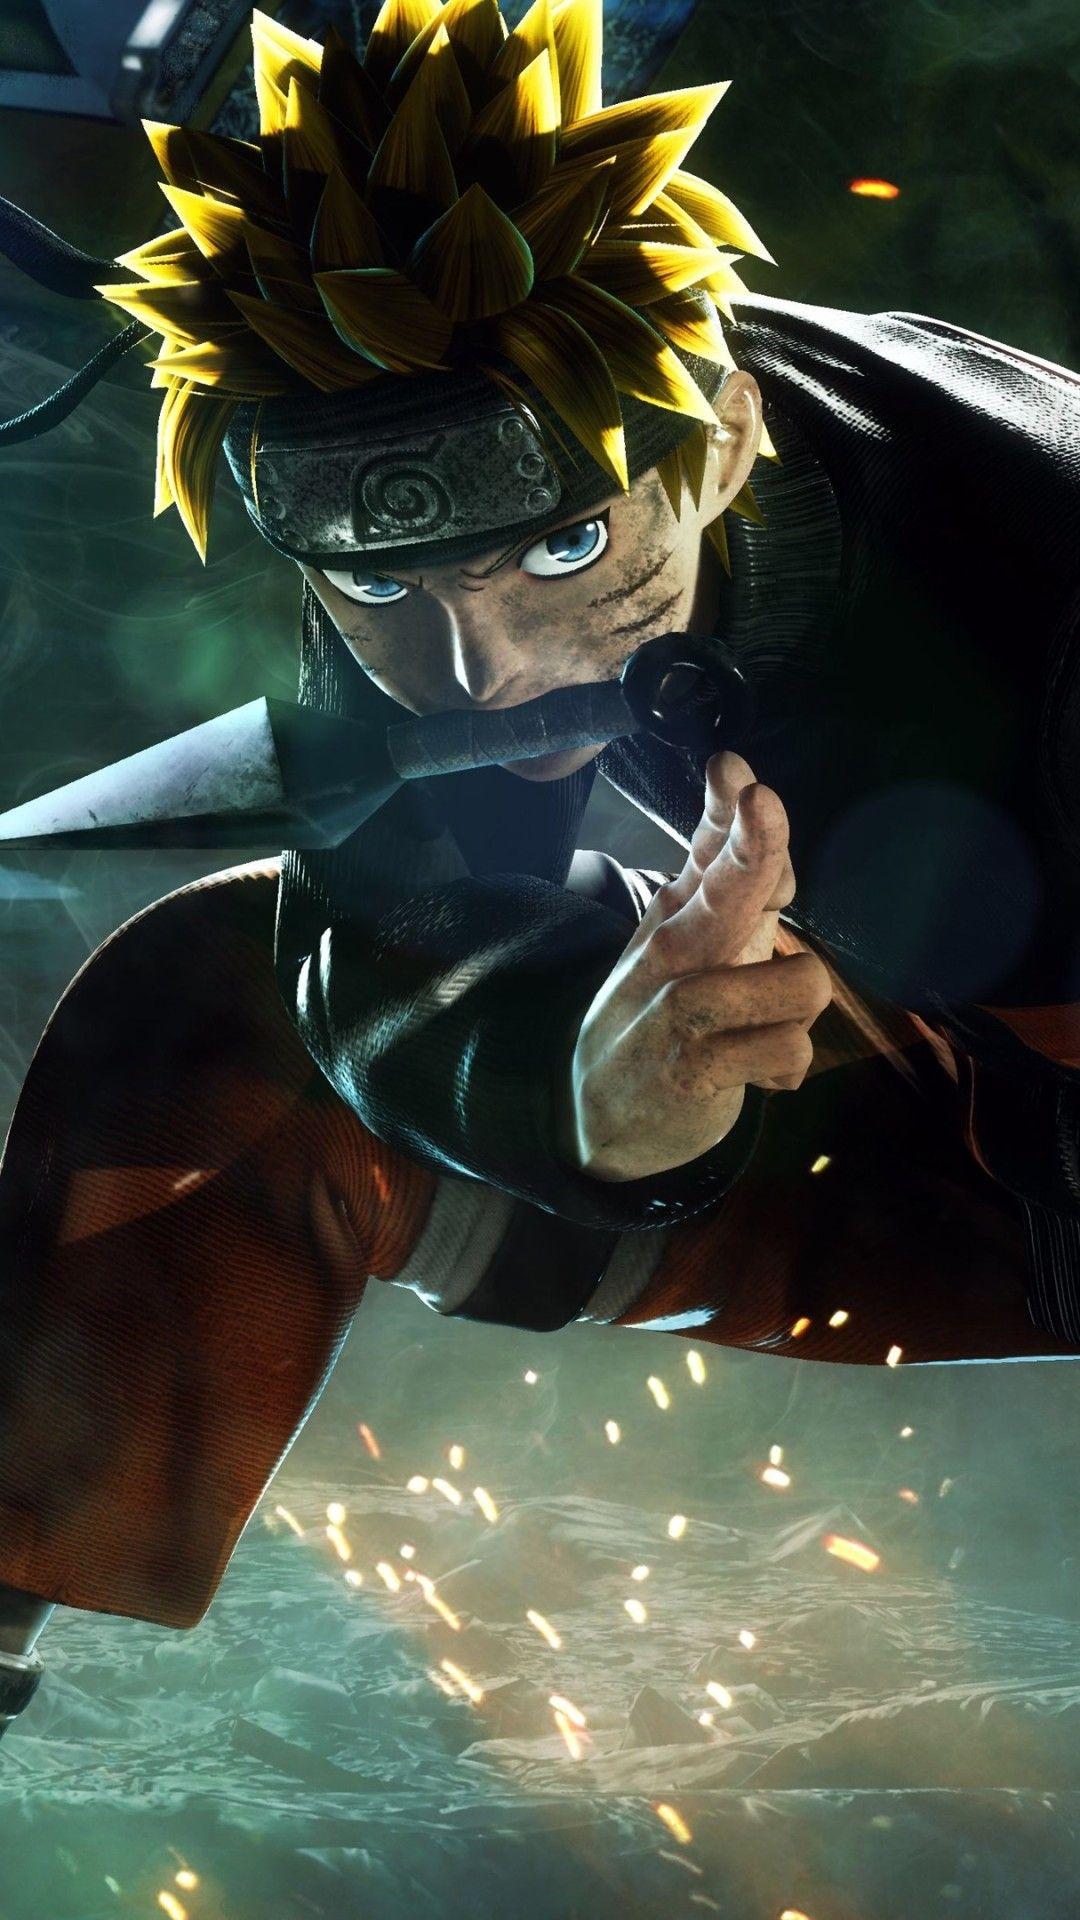 Pin de Manzoorhusdain em Naruto Wallpaper em 2020 Papéis